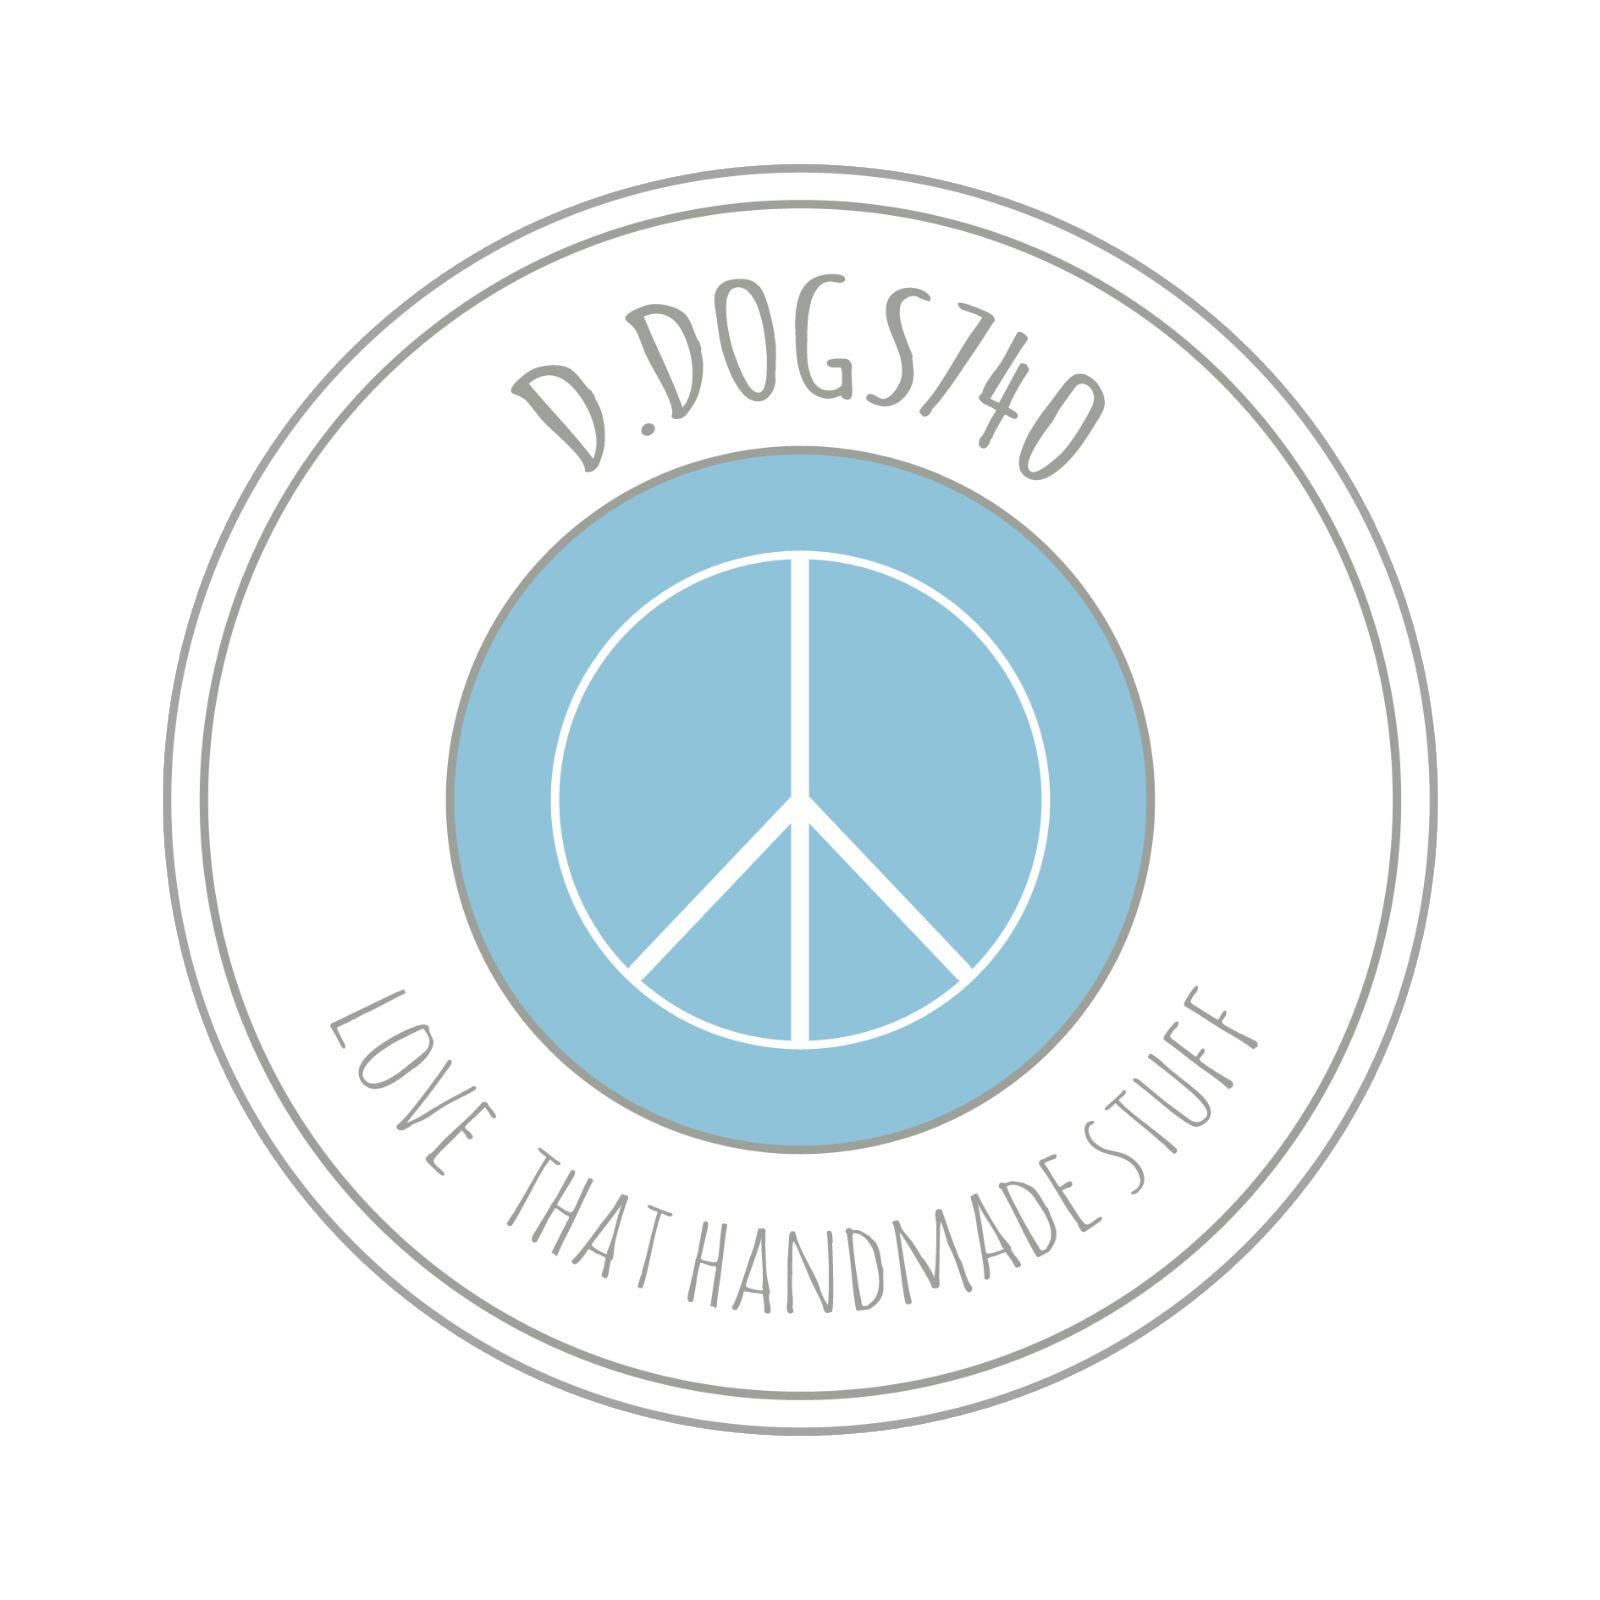 d-dogs740.de